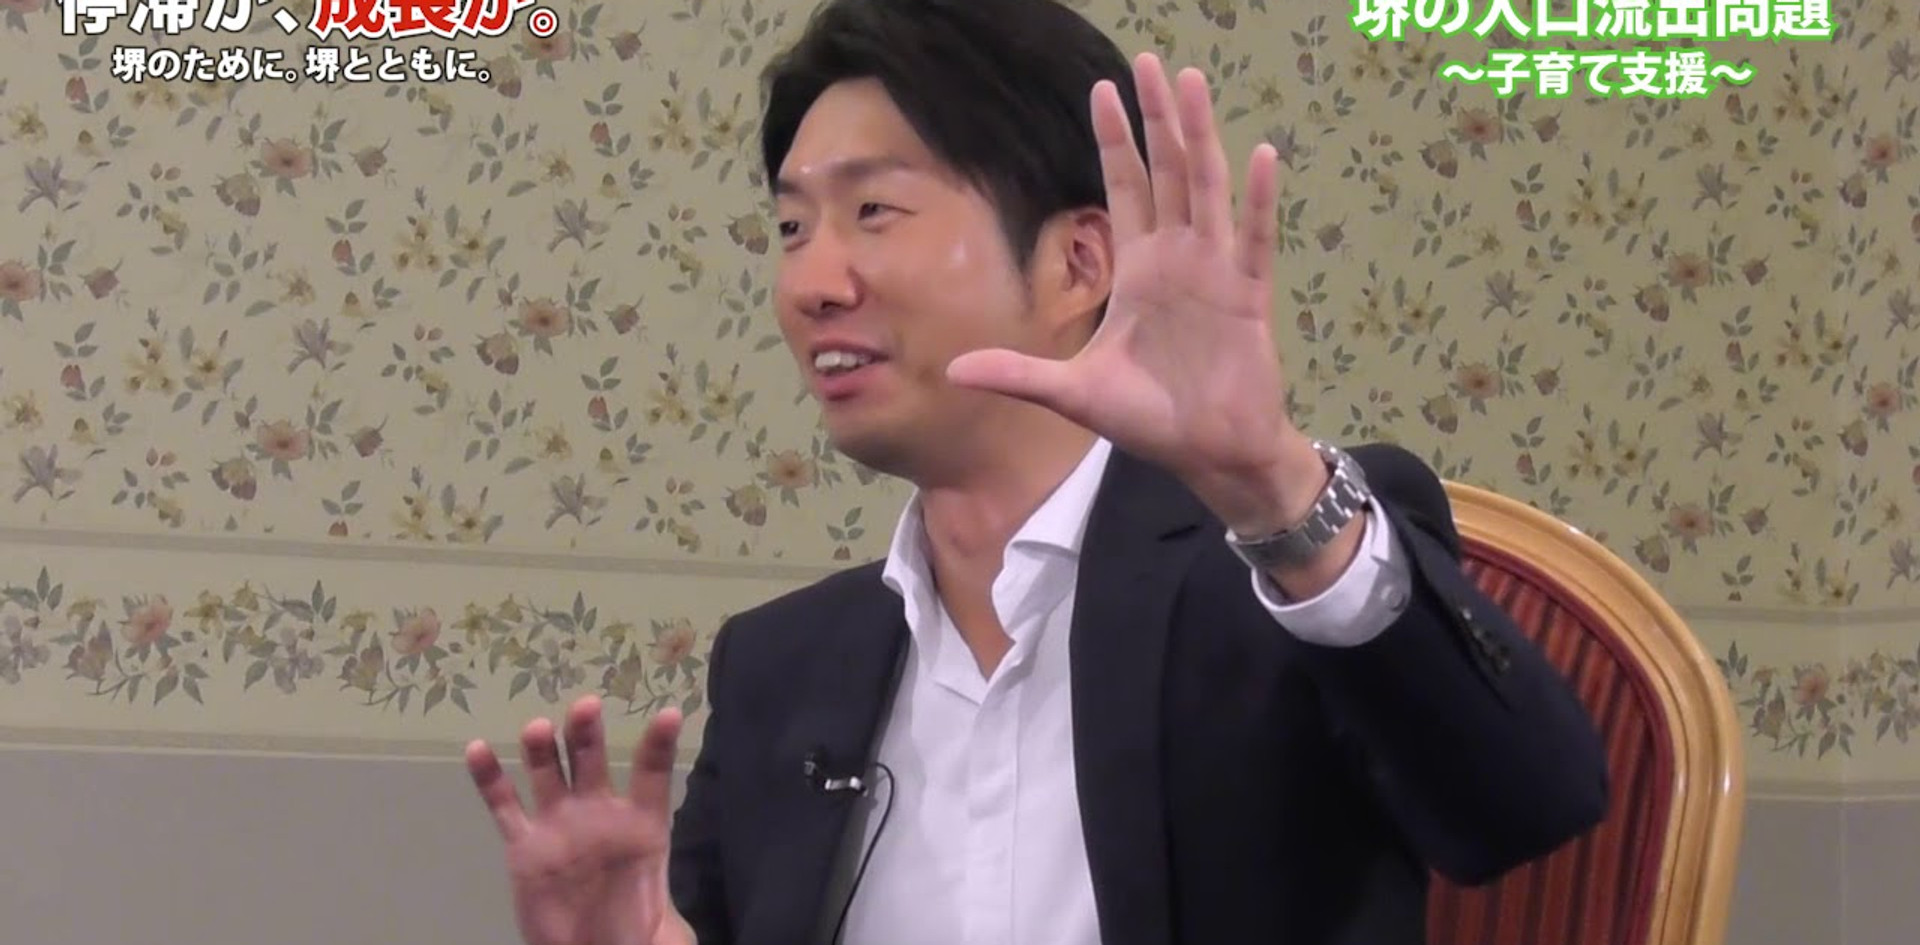 ②松井×永藤 堺の人口流出問題ー子育て支援